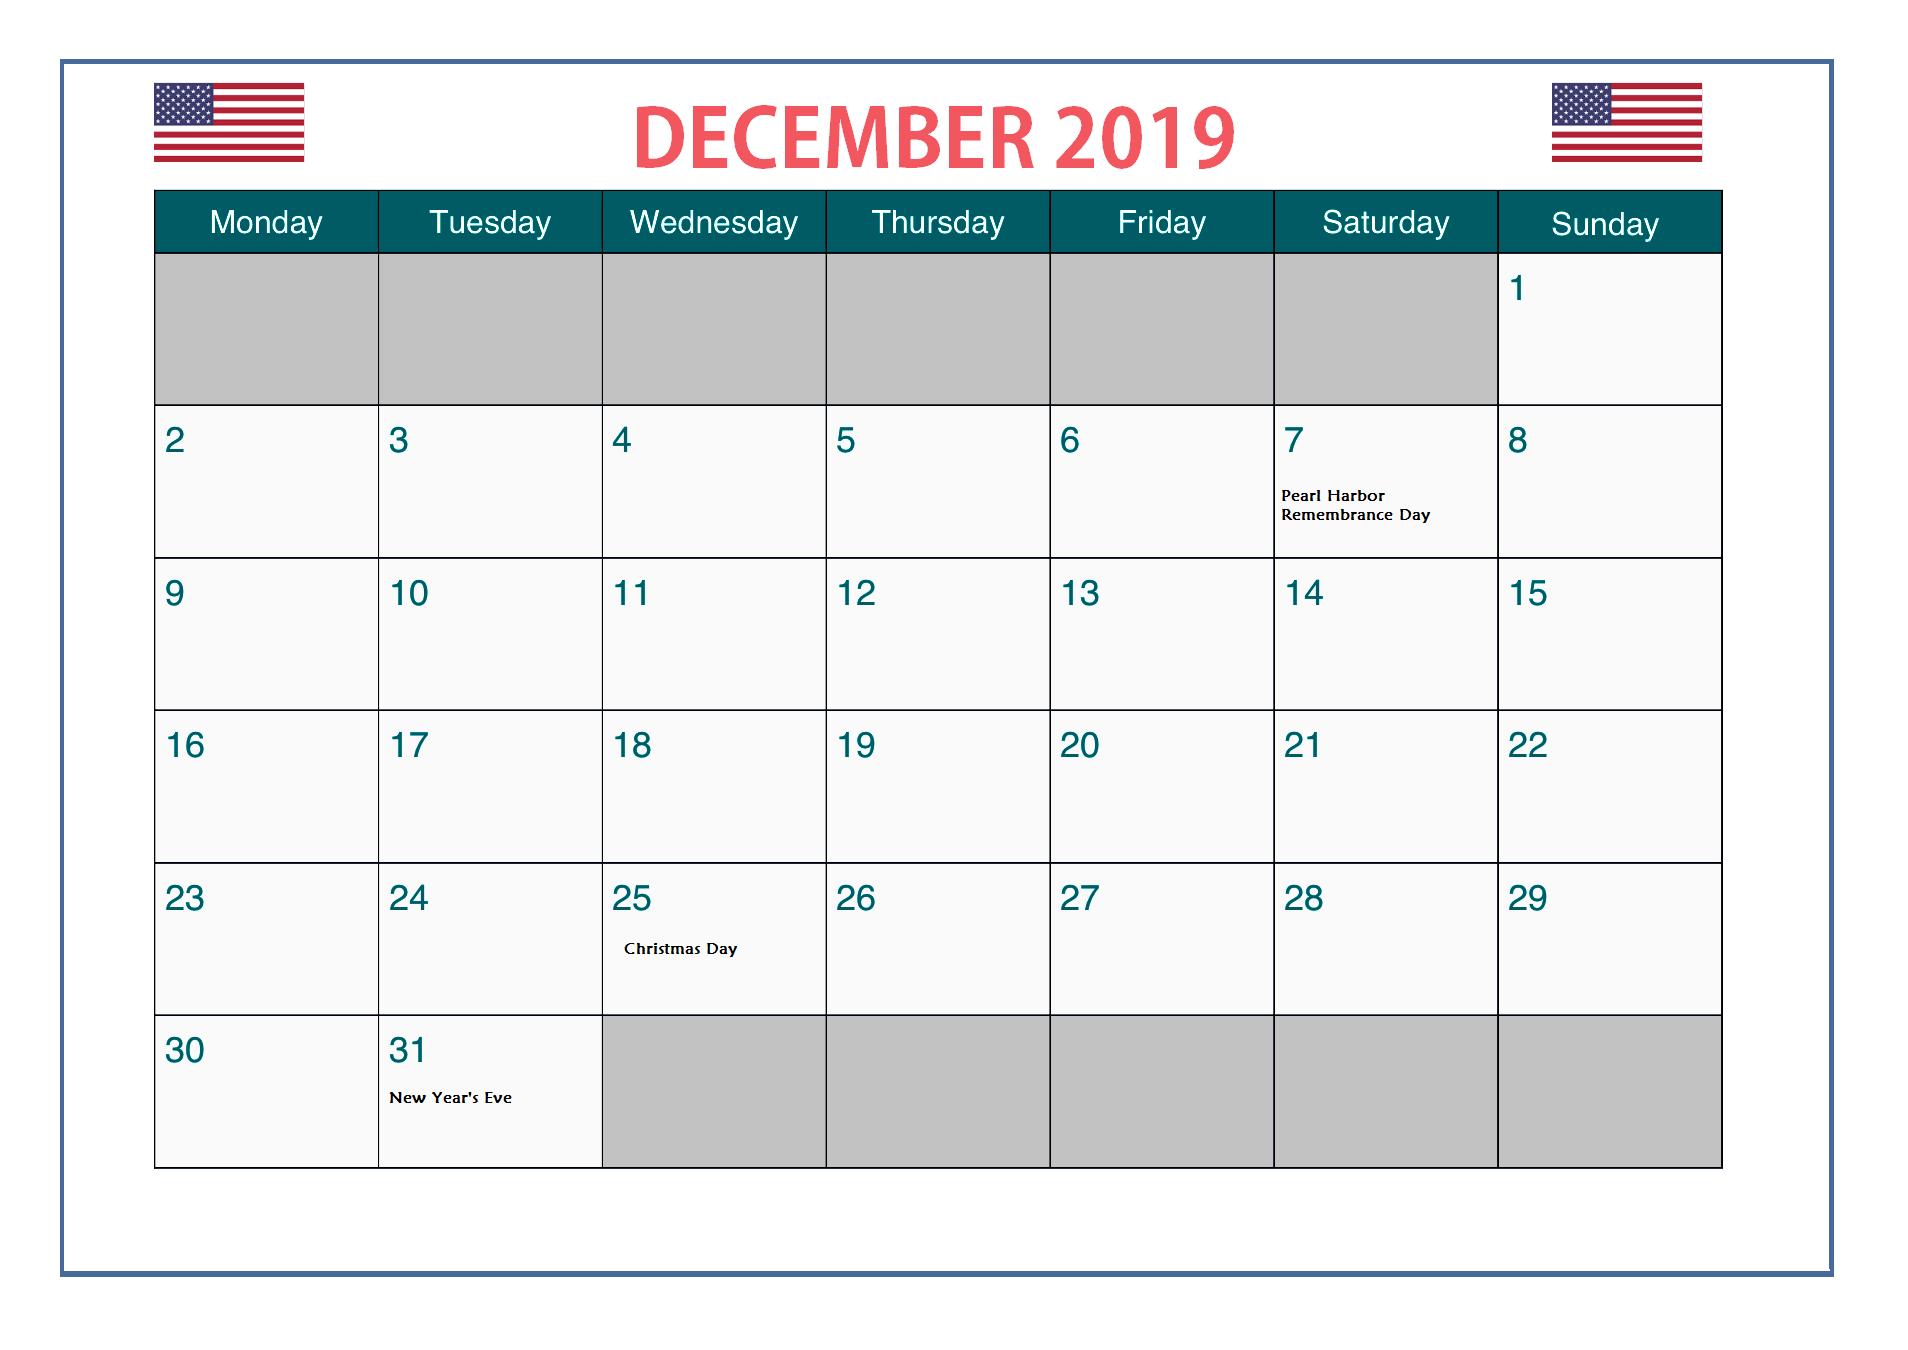 December 2019 USA Holidays Calendar Holiday calendar